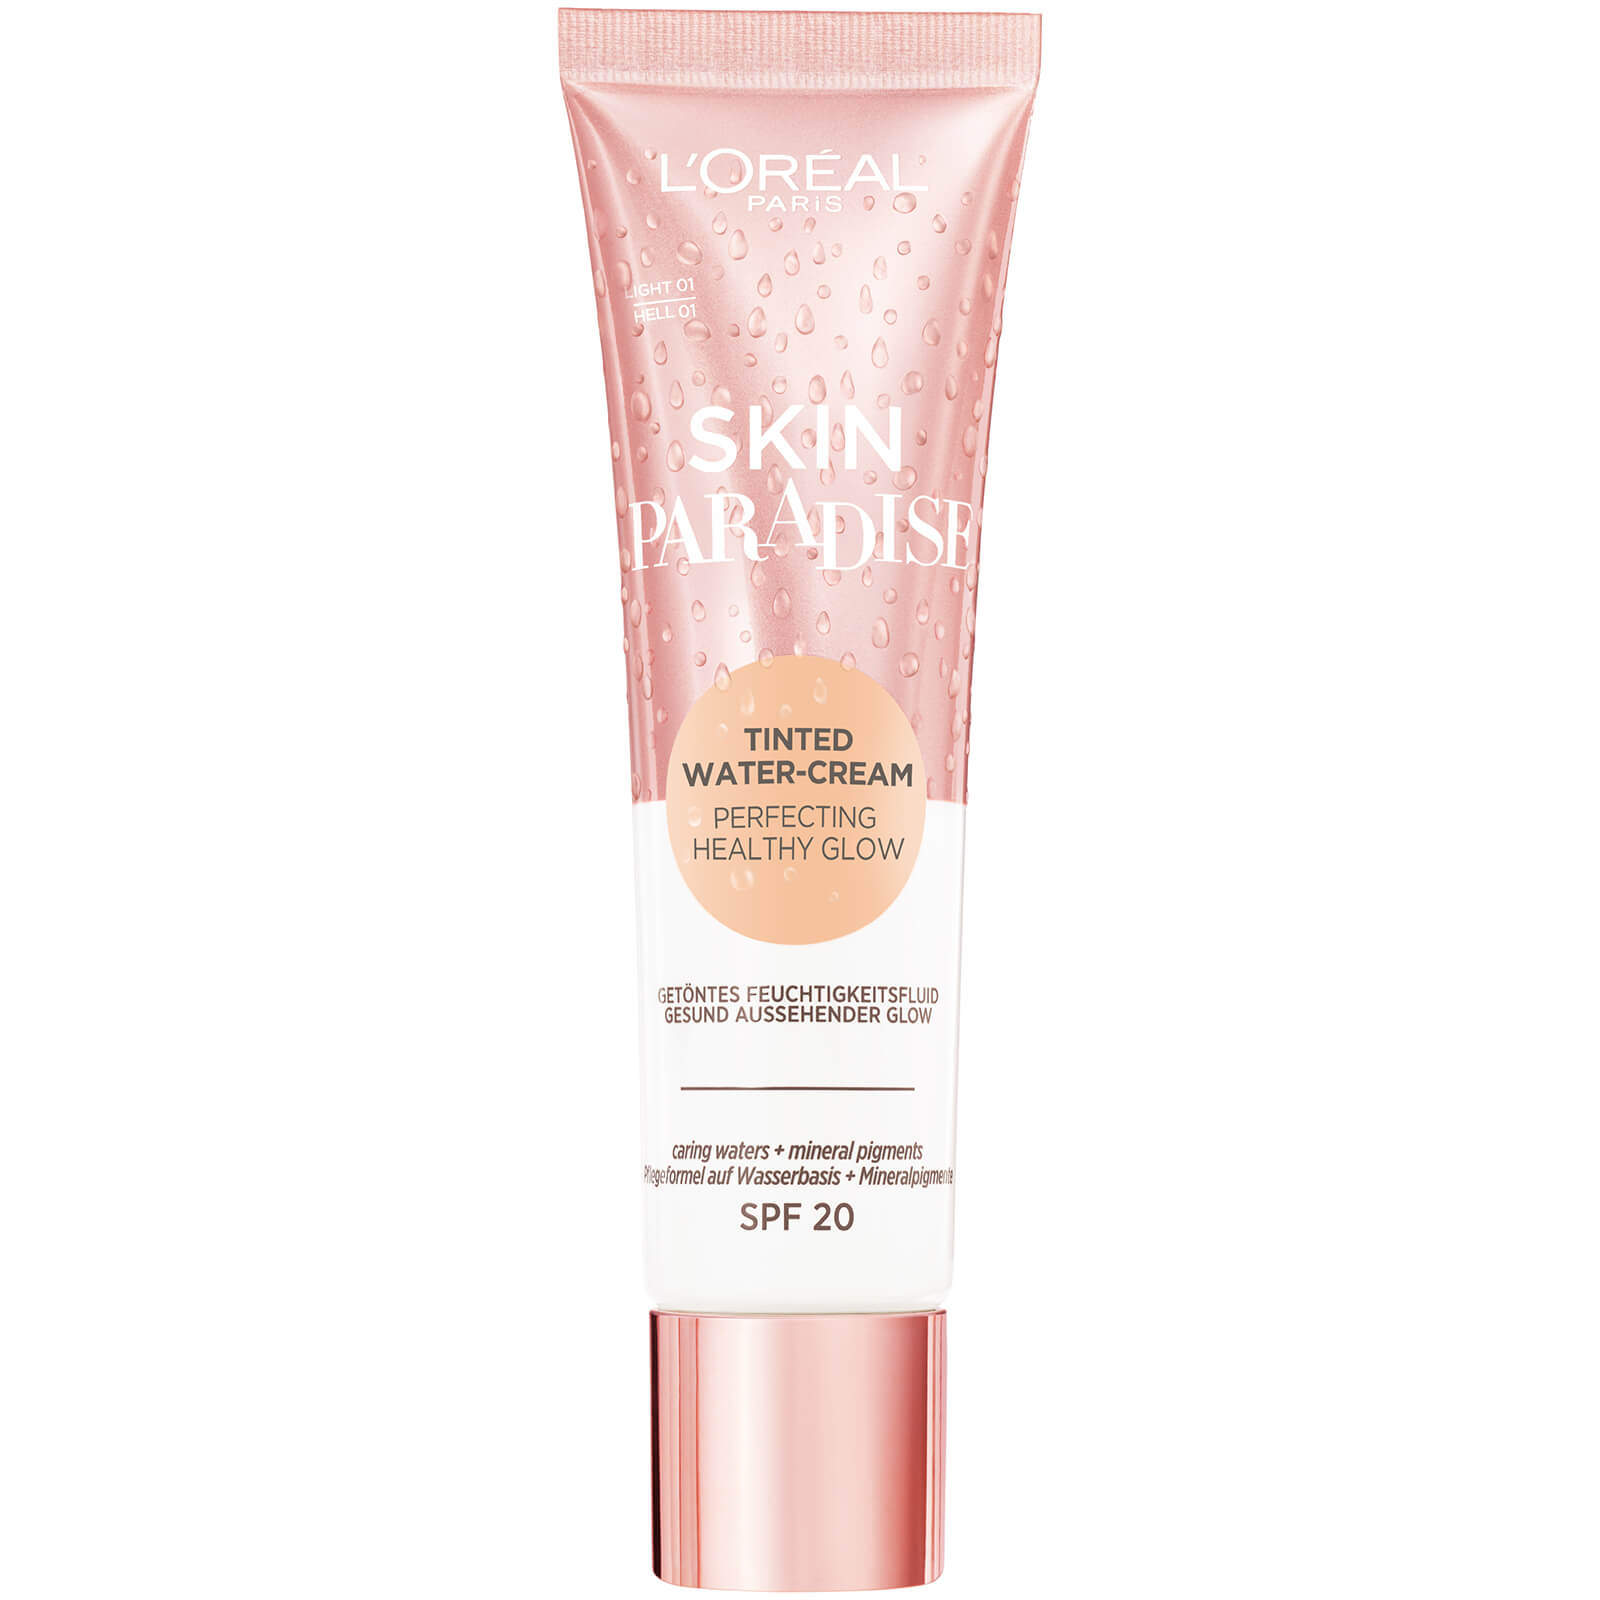 Купить L'Oréal Paris Skin Paradise Tinted Moisturiser SPF20 30ml (Various Shades) - Light 01